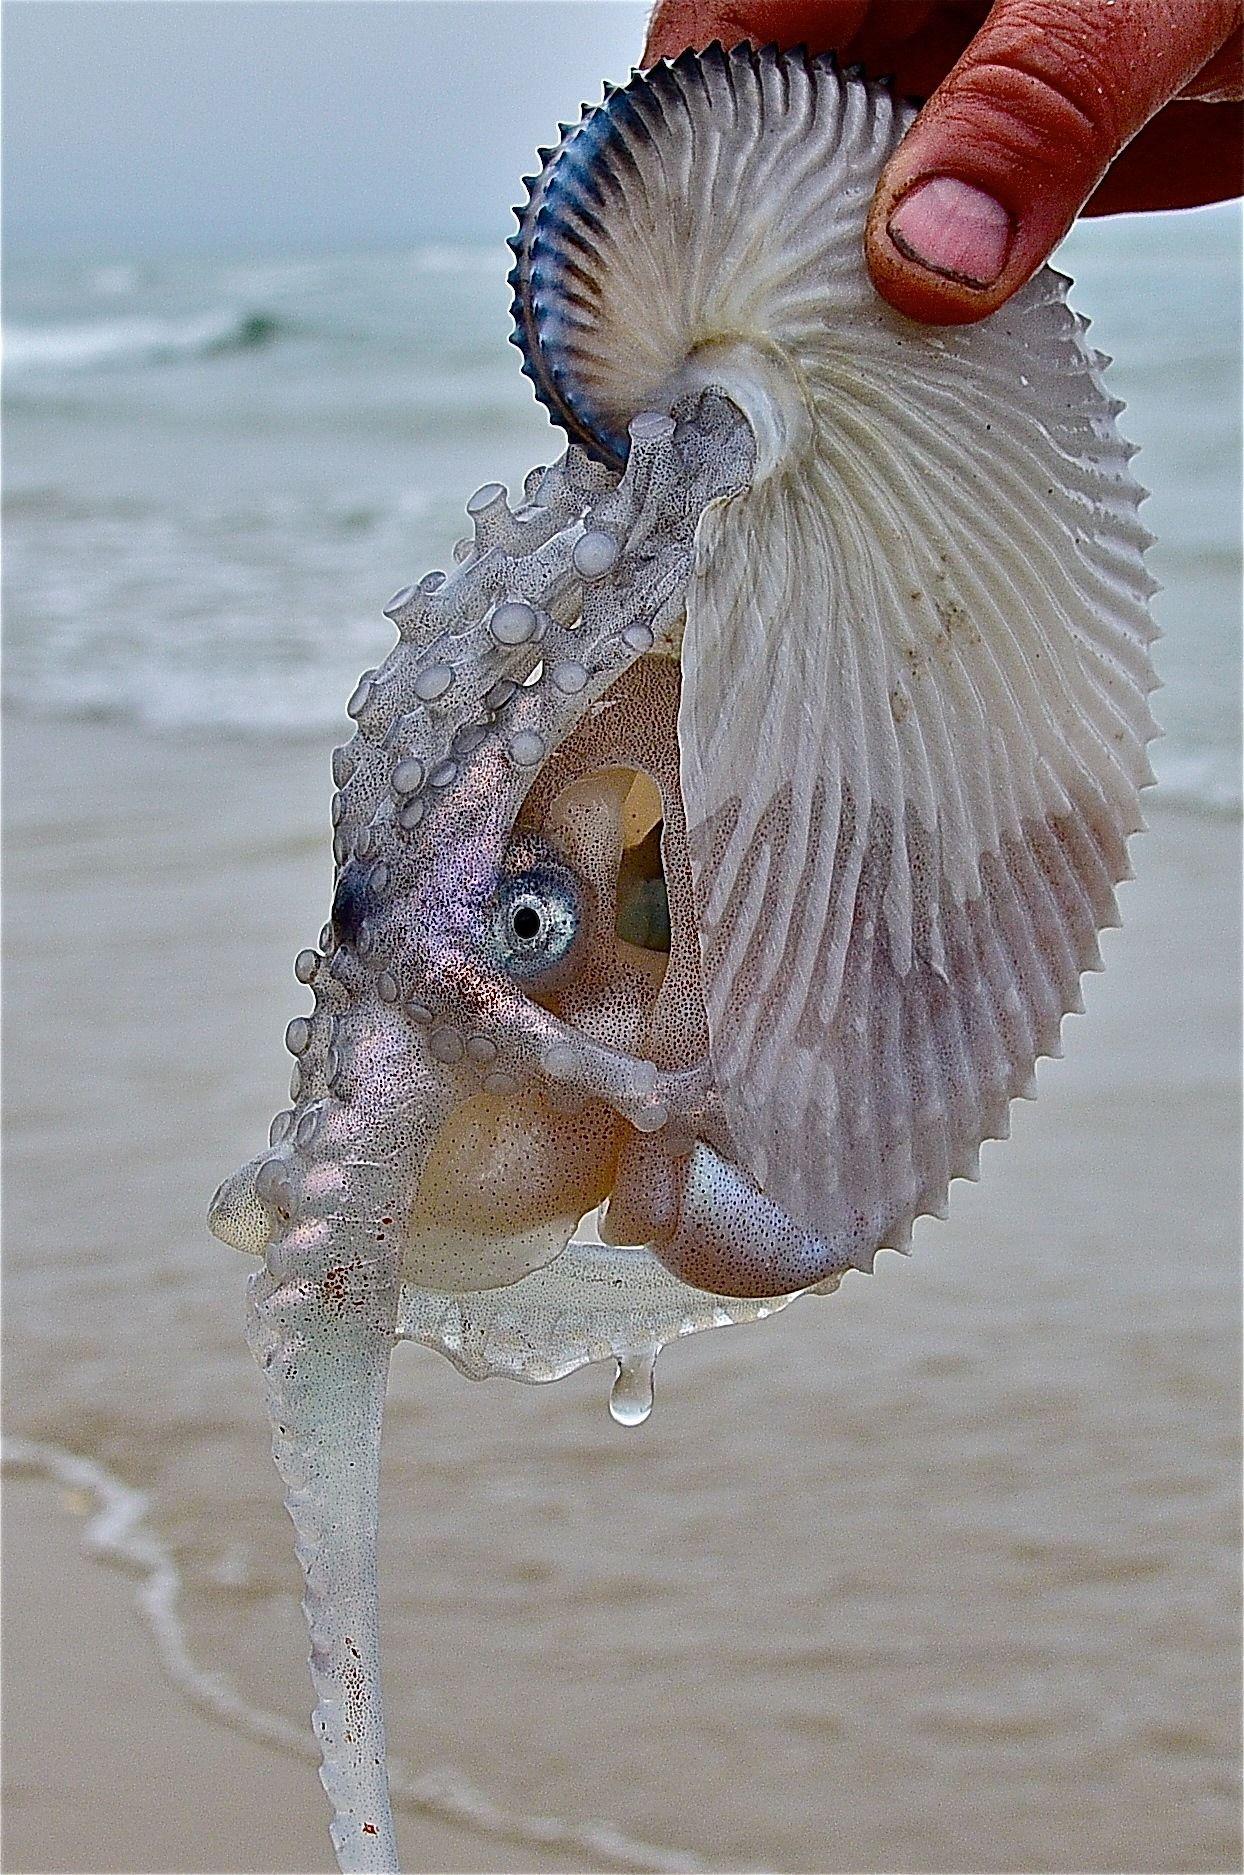 Argonaut Octopus A K A Paper Nautilus Animales Acuaticos Stuffed Animals Animales Marinos